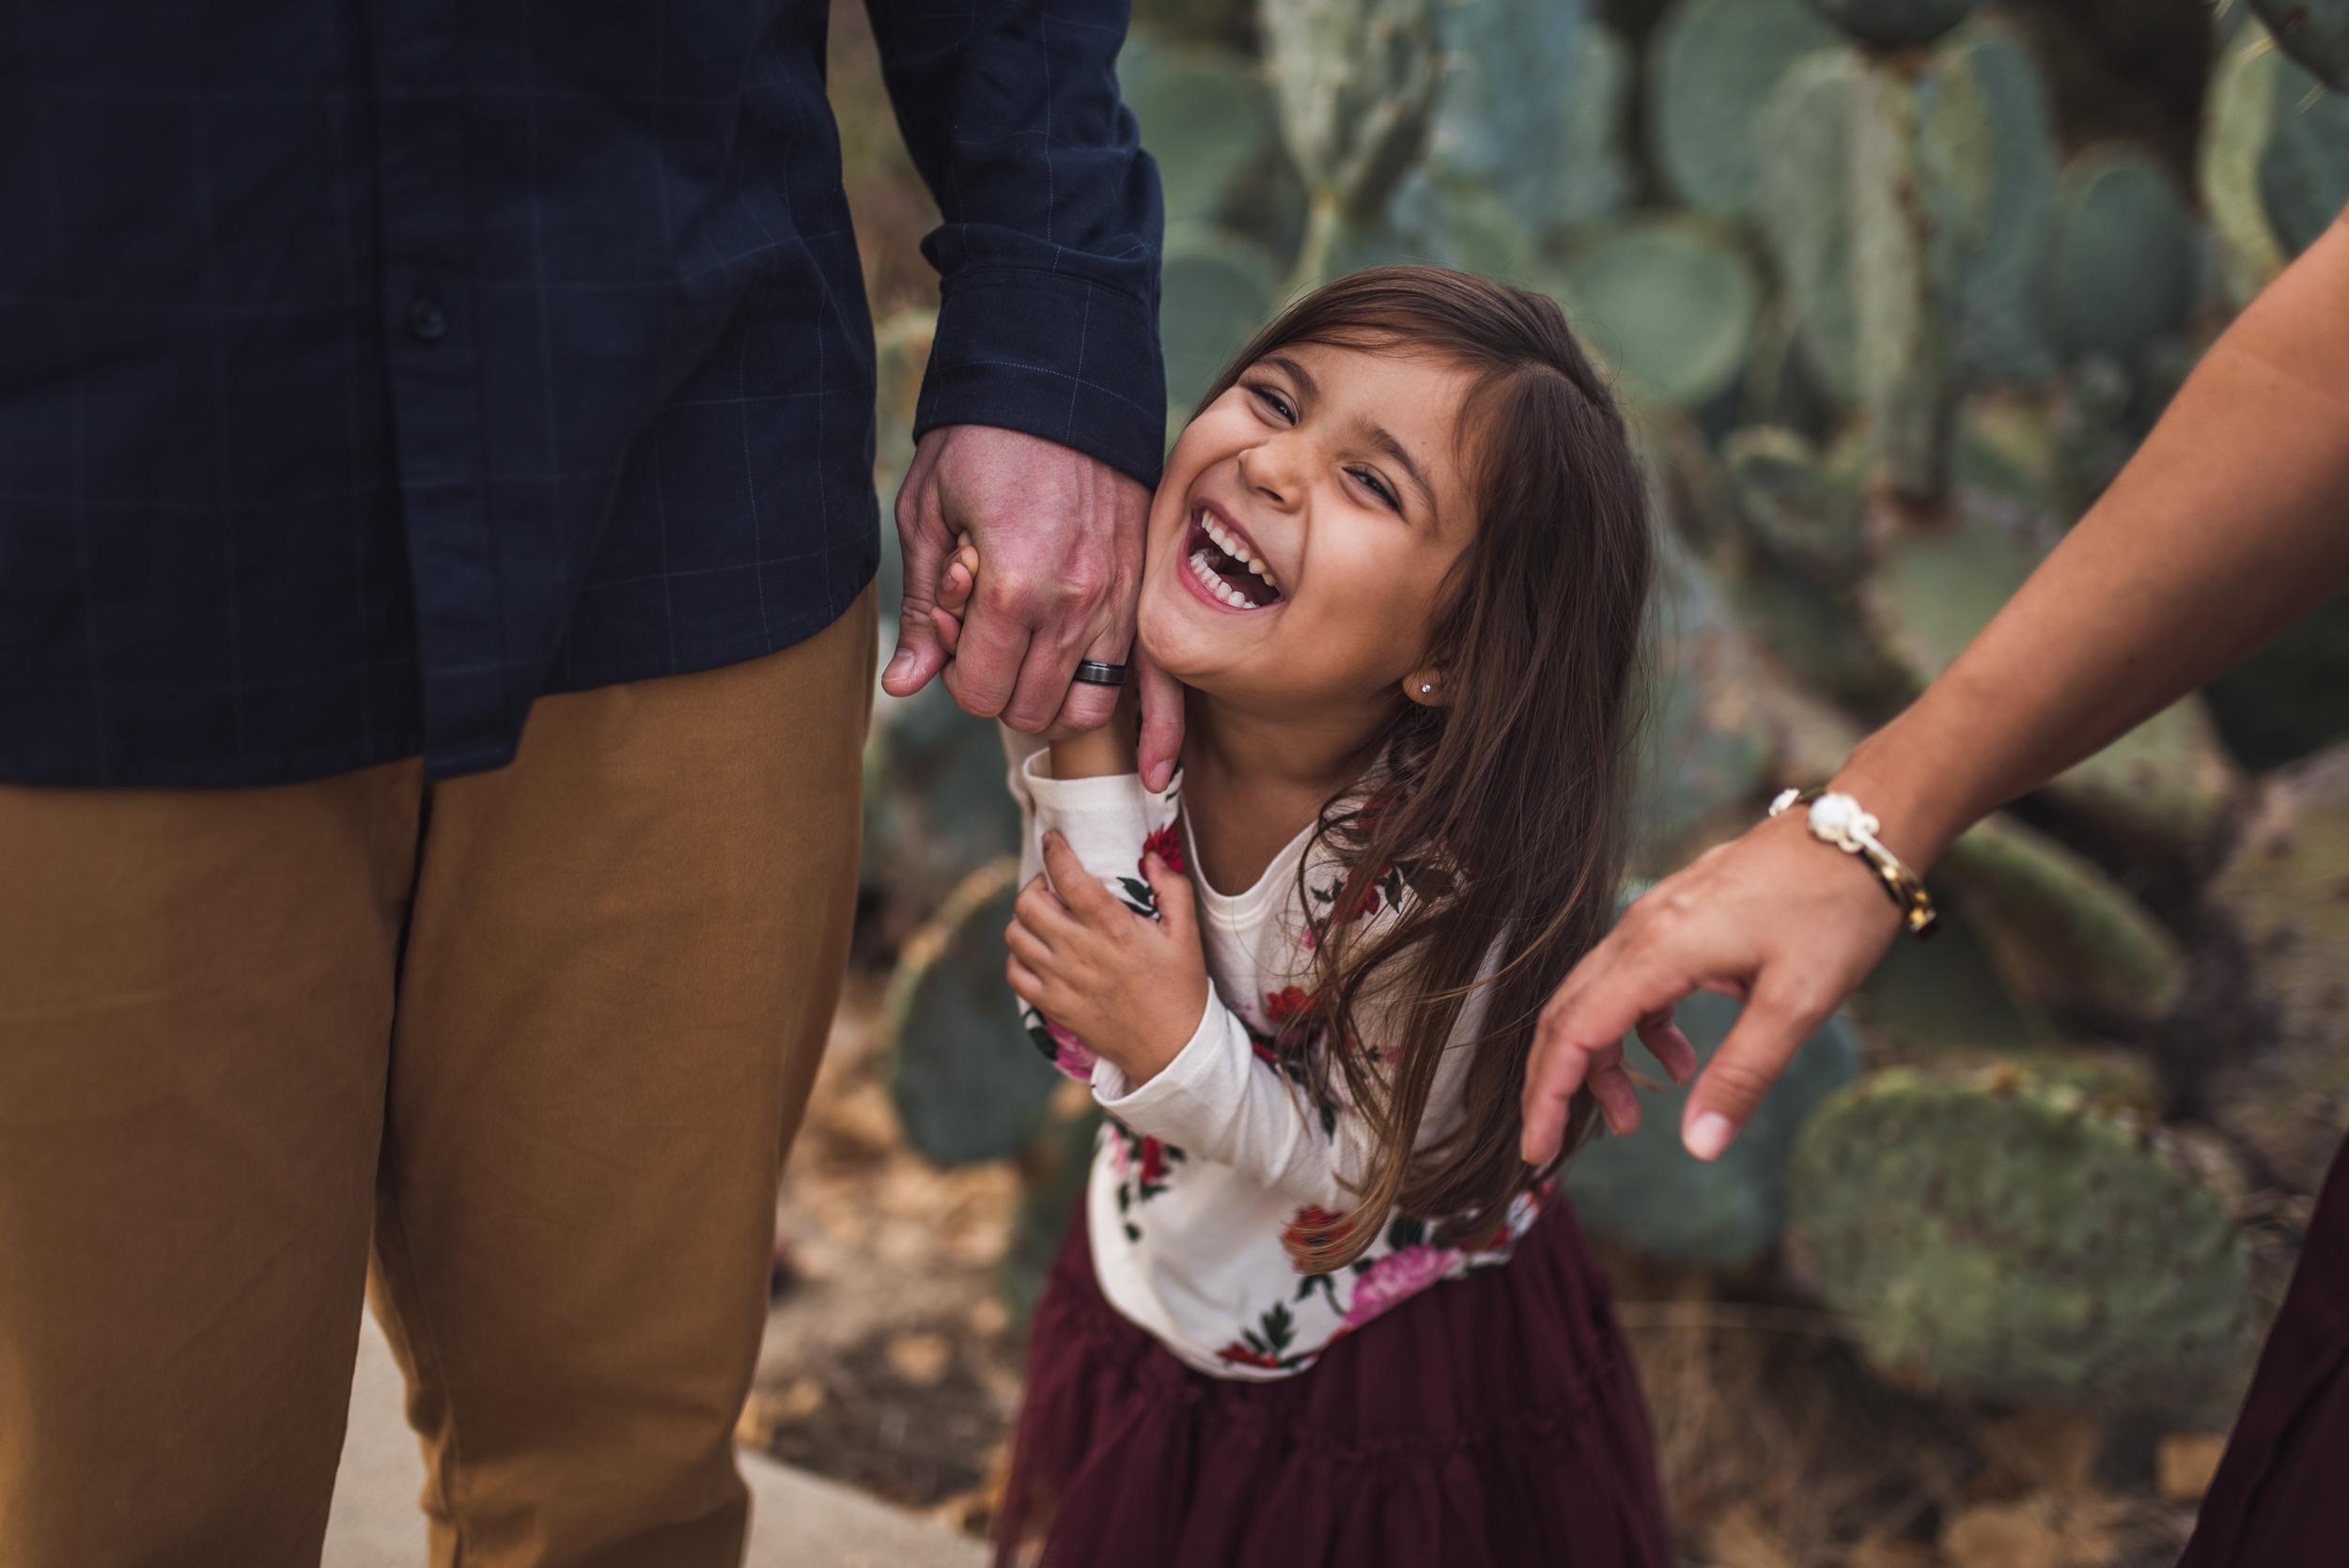 2018-San-Diego-Family-Lifestyle-Newborn-Travel-Vacation-Photographer-Kelsey-Smith-Photography-Coronado-La-Jolla-Encinitas-Solana-Beach-Del-Mar-111.jpg